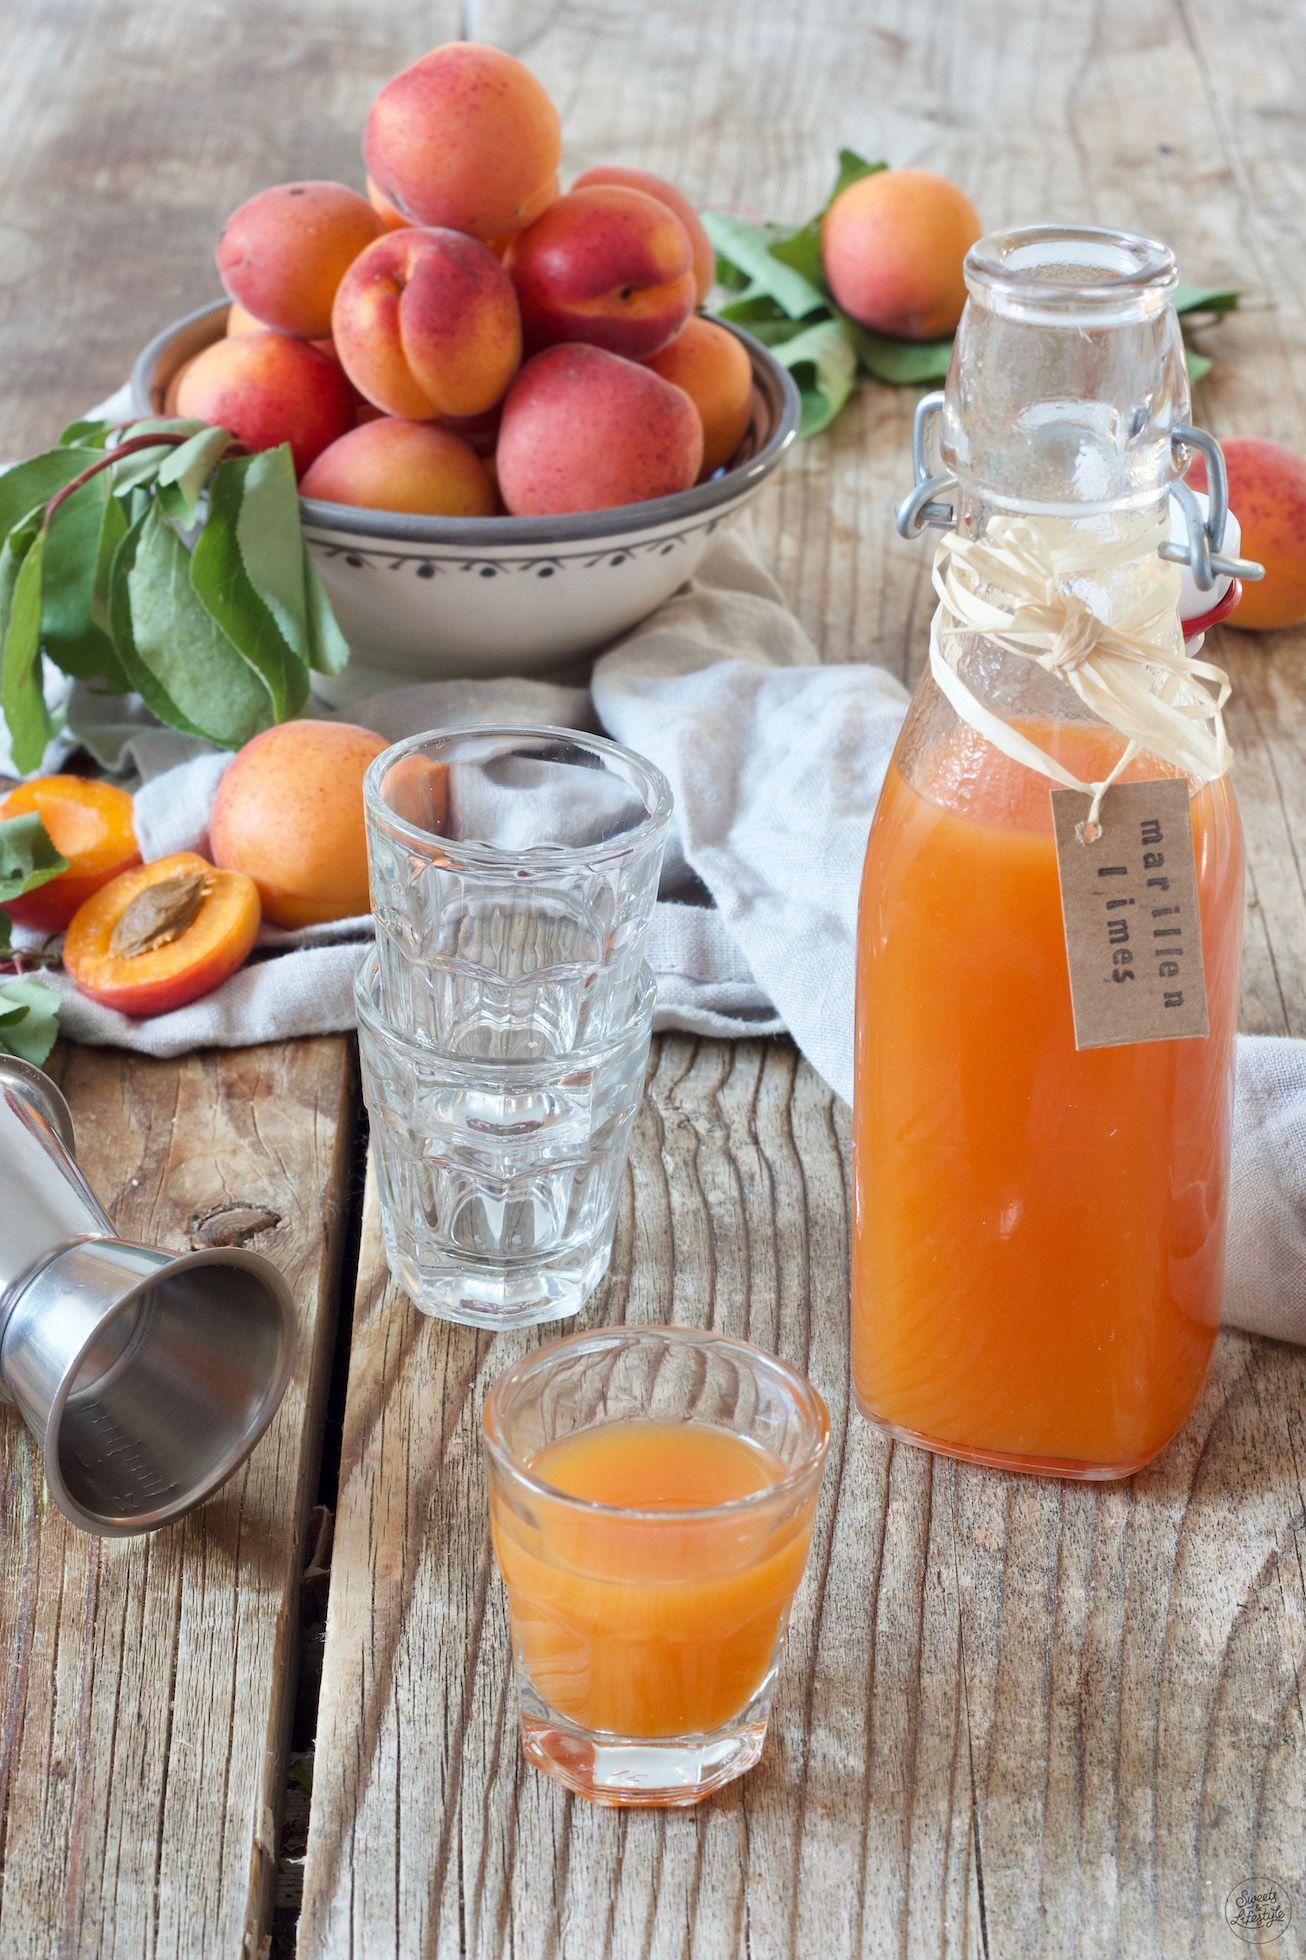 Marillenlimes - Aprikosenlimes - Rezept - Sweets & Lifestyle